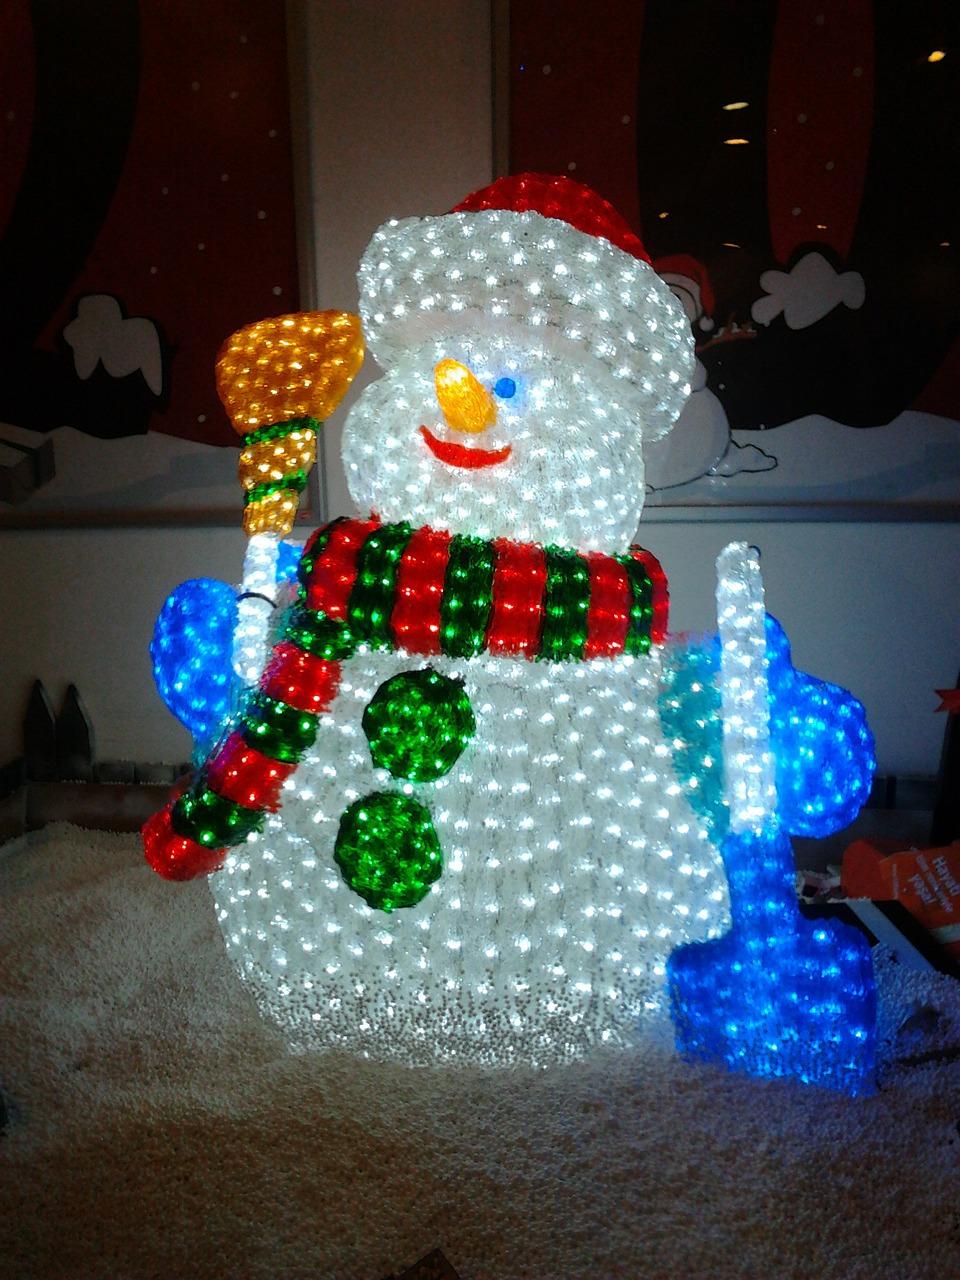 snowman-212140_1280